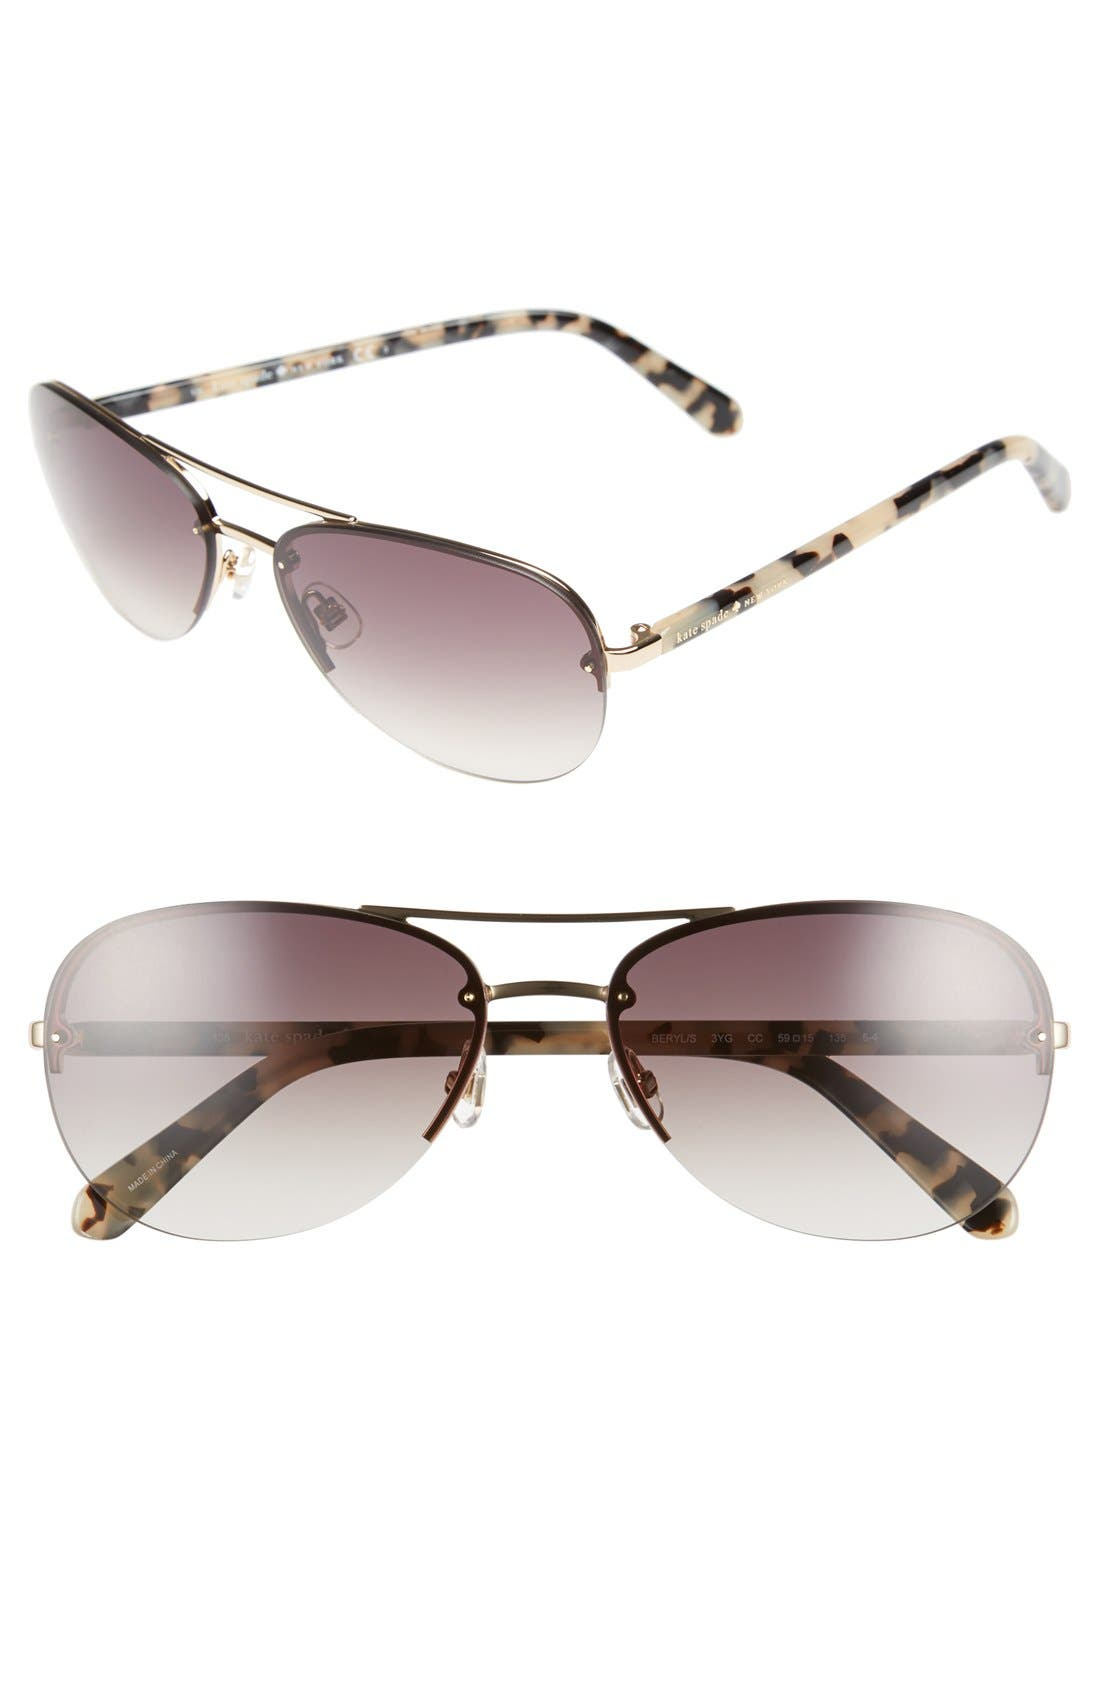 Image of kate spade new york beryls 59mm sunglasses